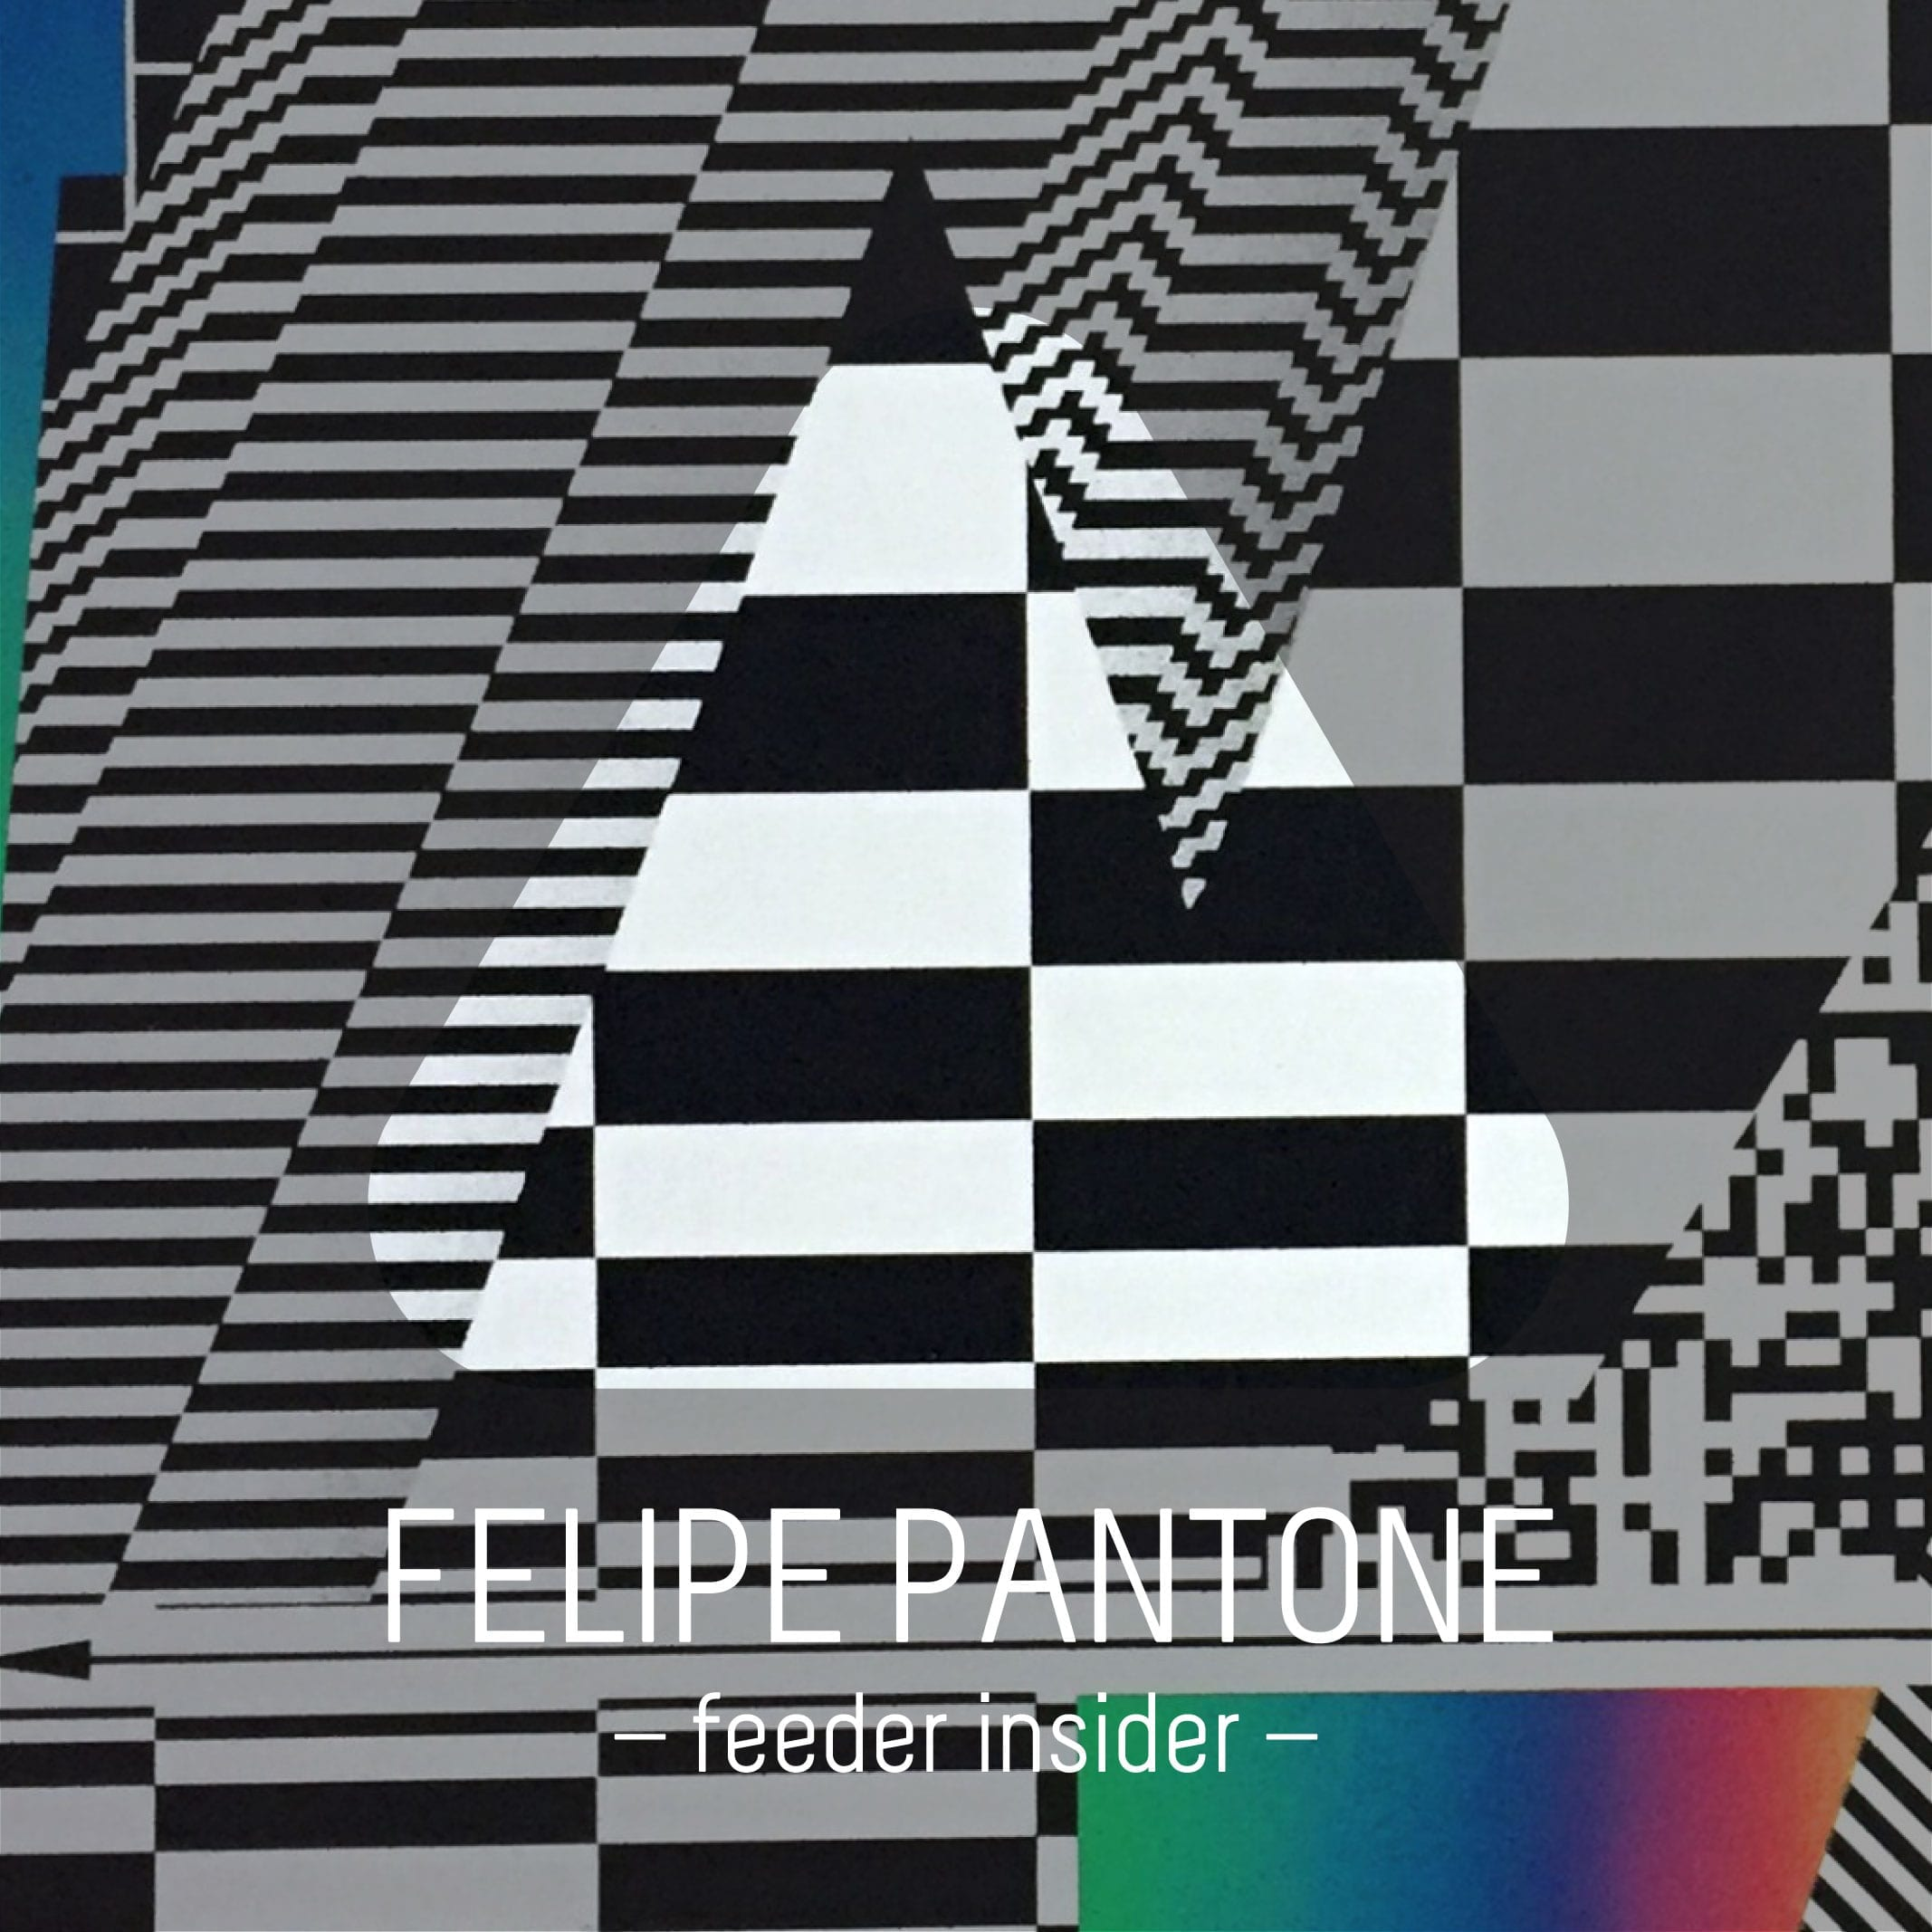 feeder insider with Felipe Pantone